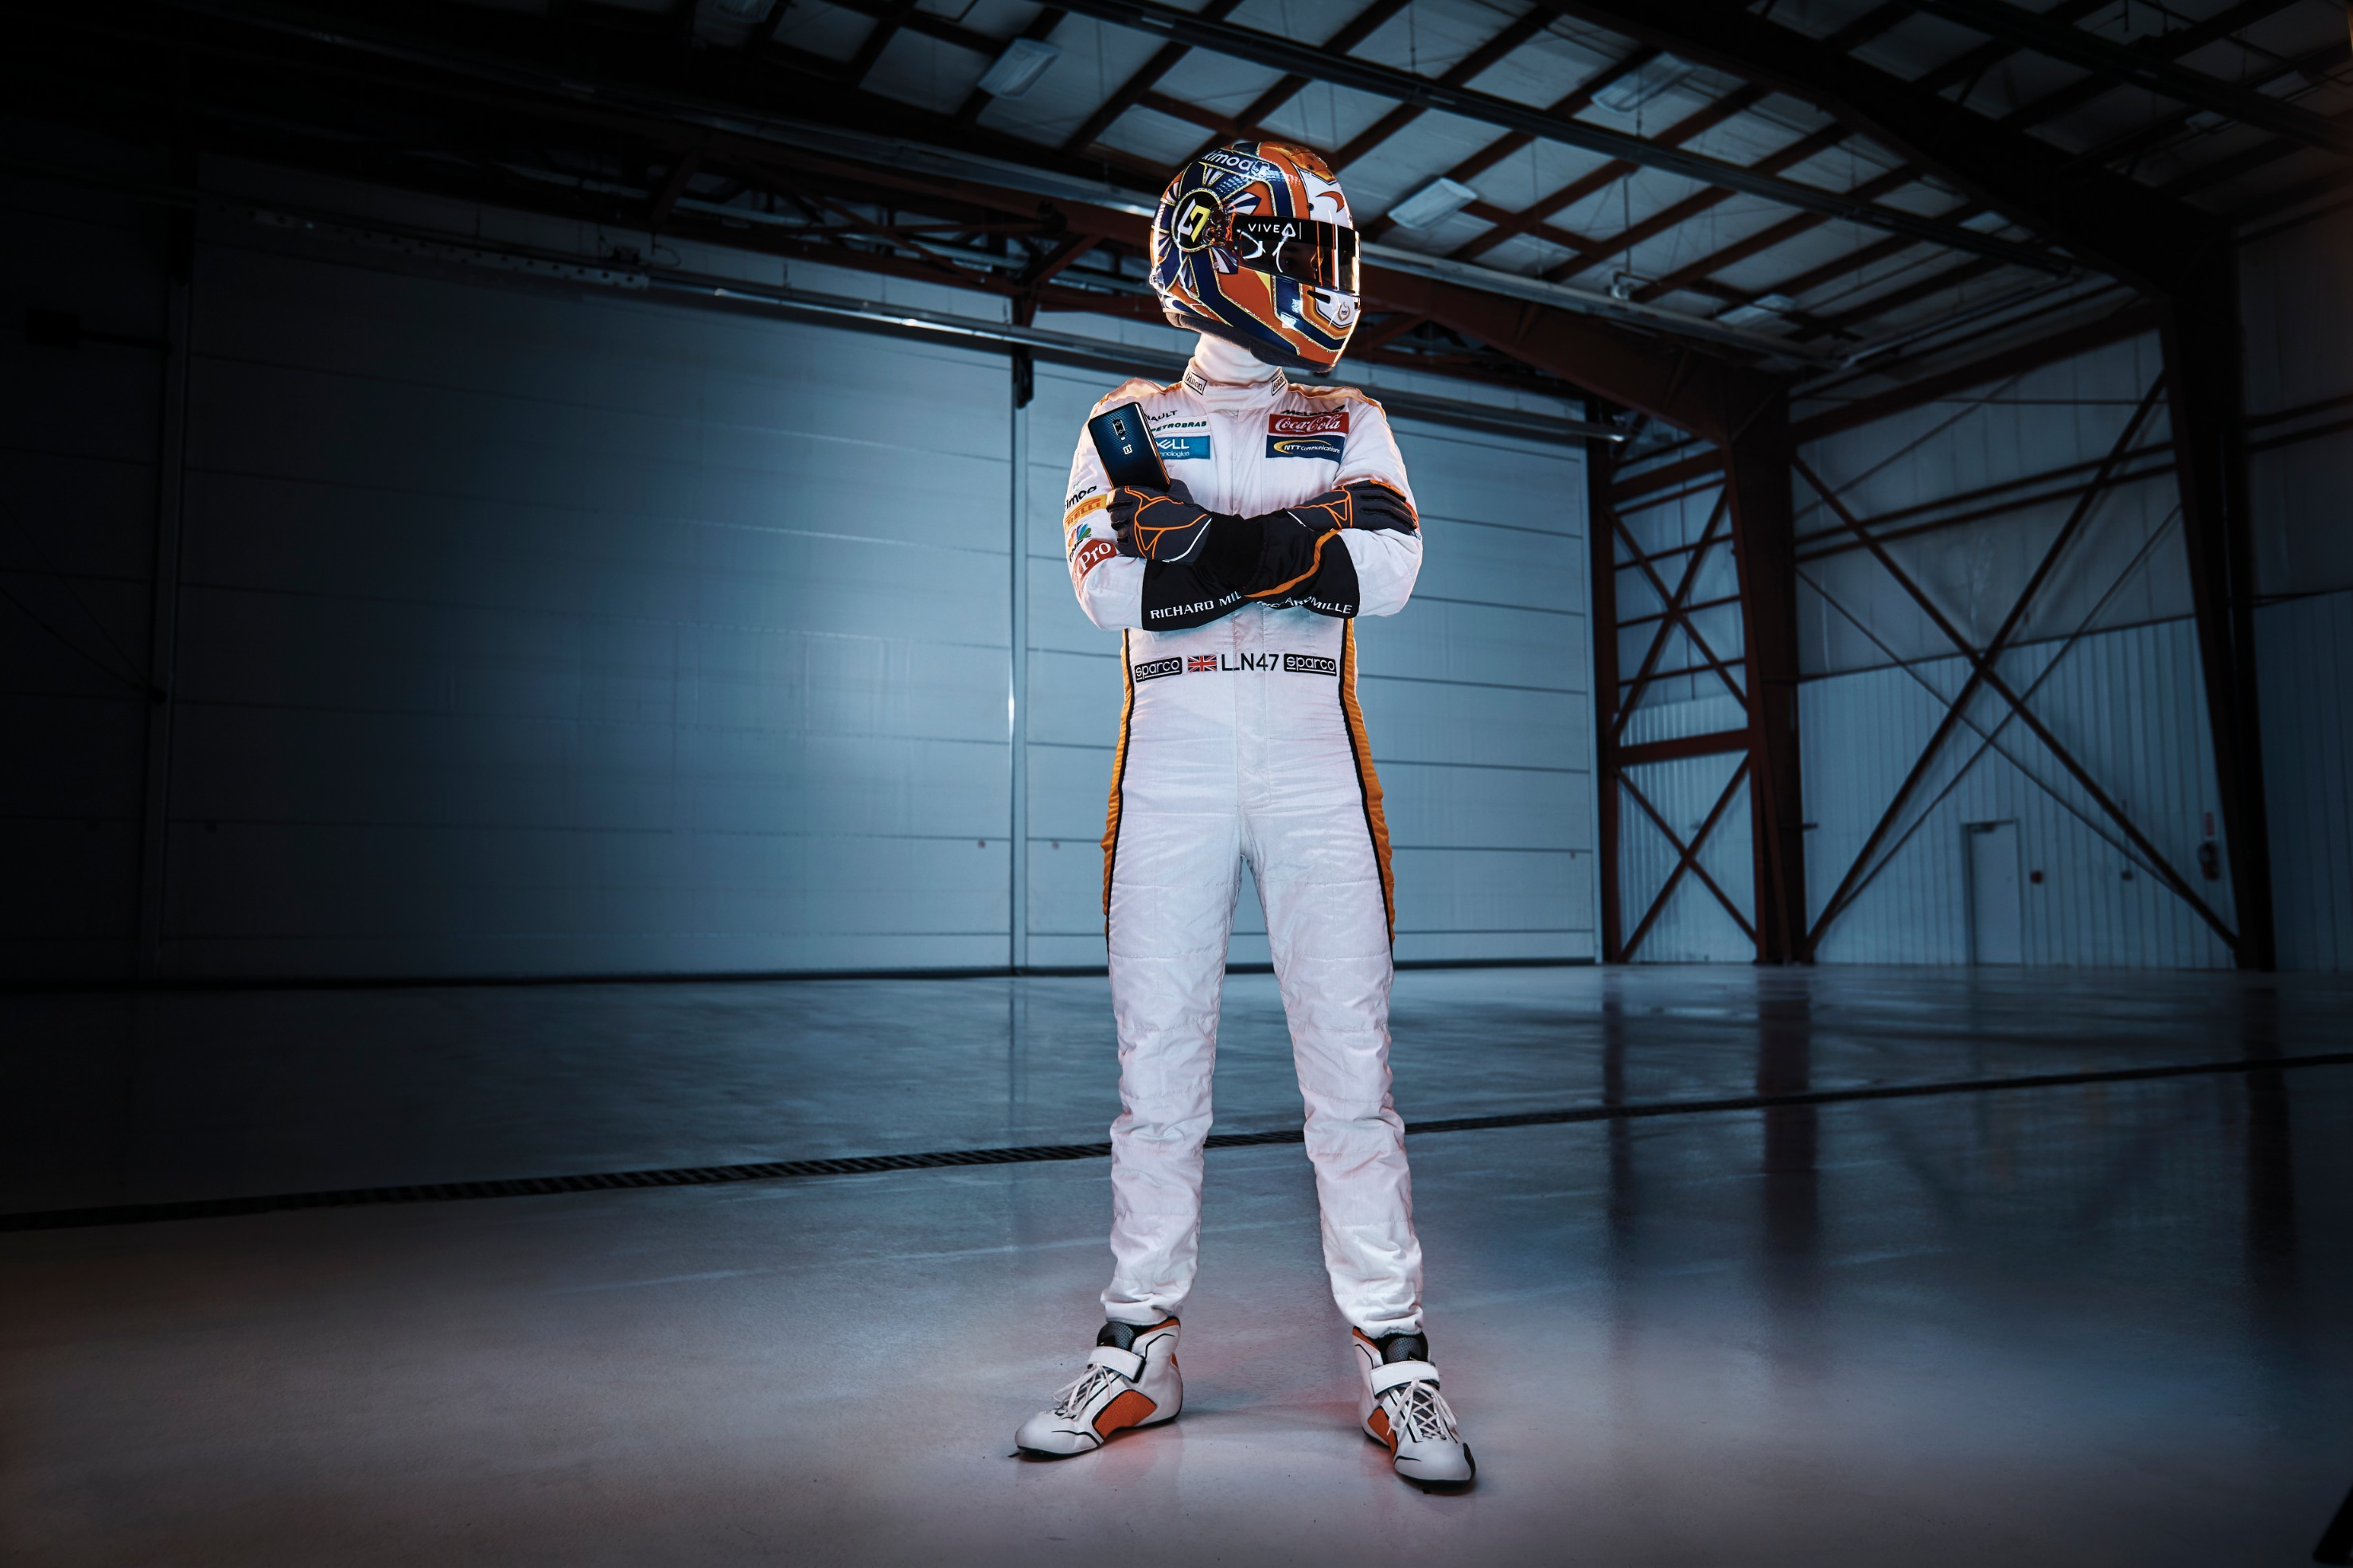 OnePlus 6T 'McLaren Edition'